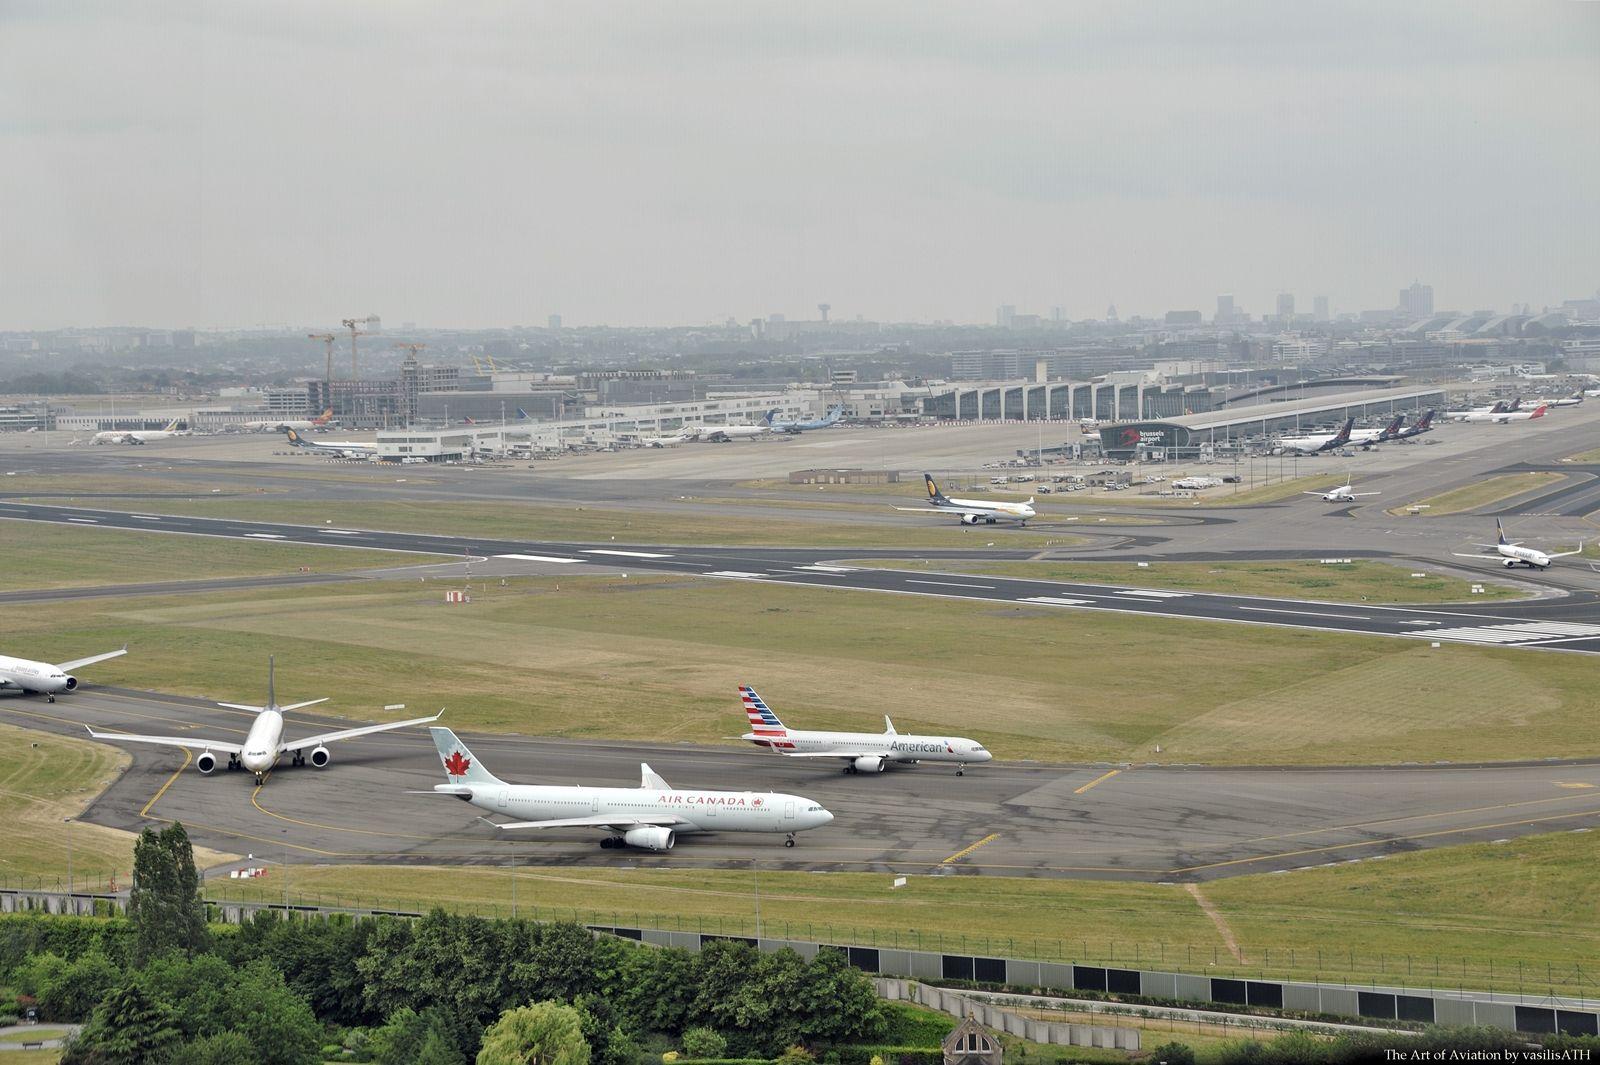 Brussels Airport (IATA: BRU, ICAO: EBBR)